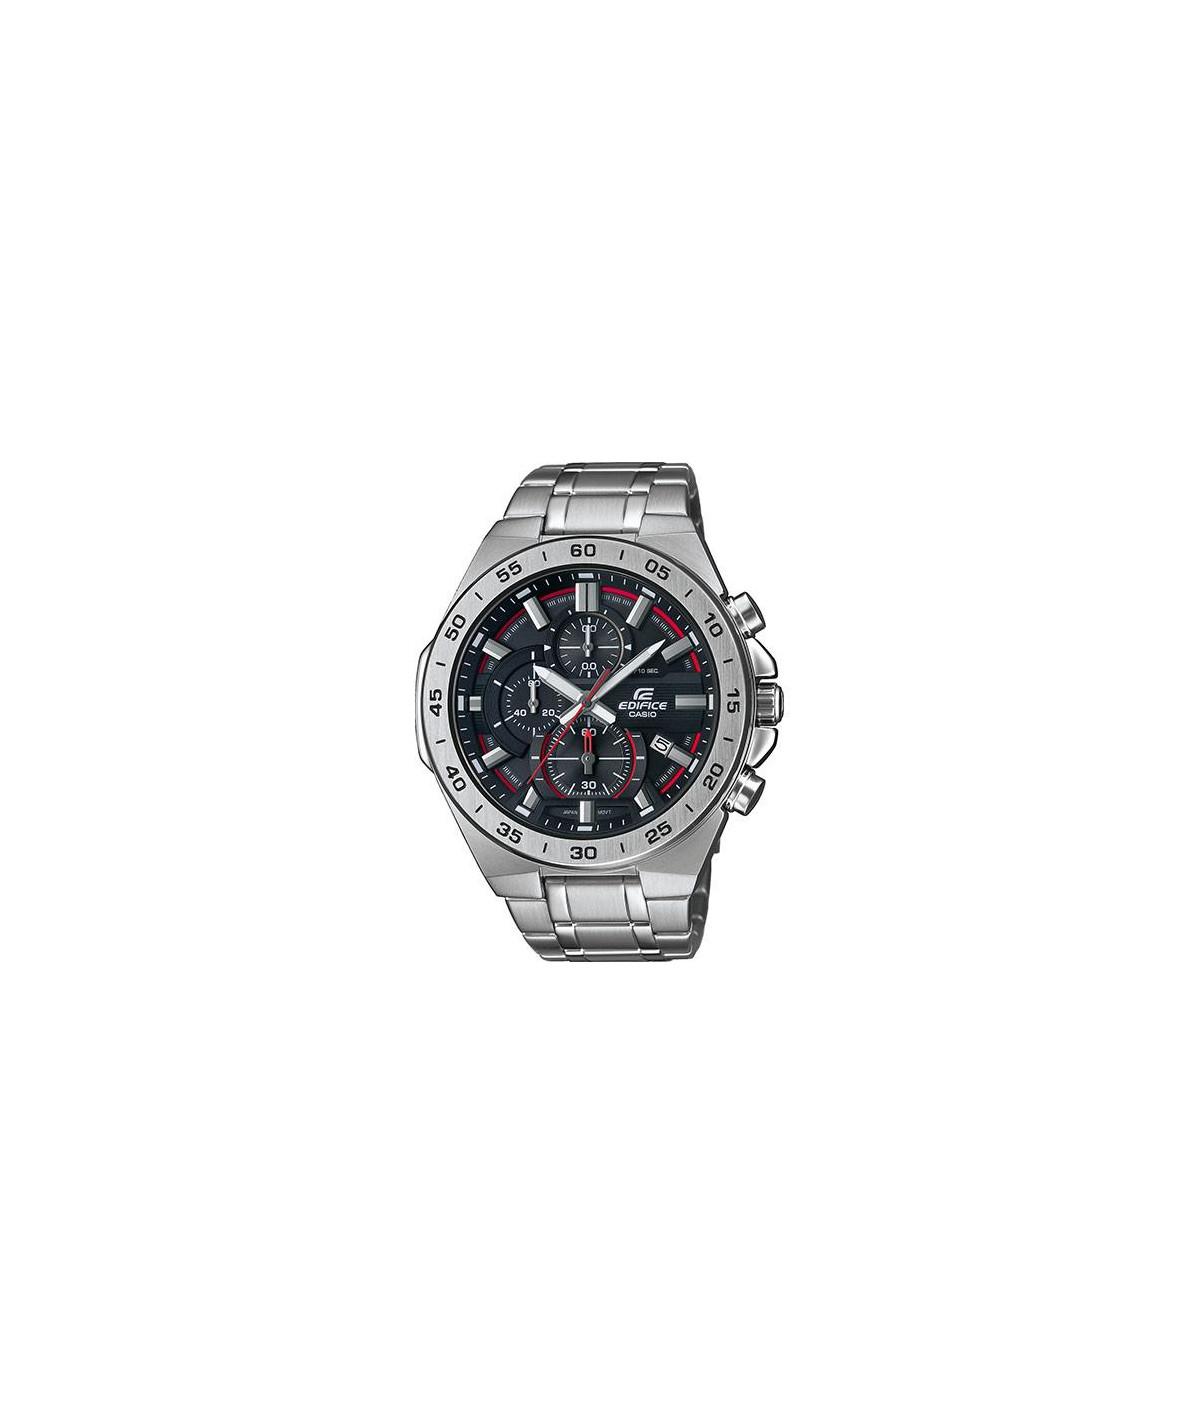 Reloj Viceroy, 40596-55, unisex, caucho. - 40596-55